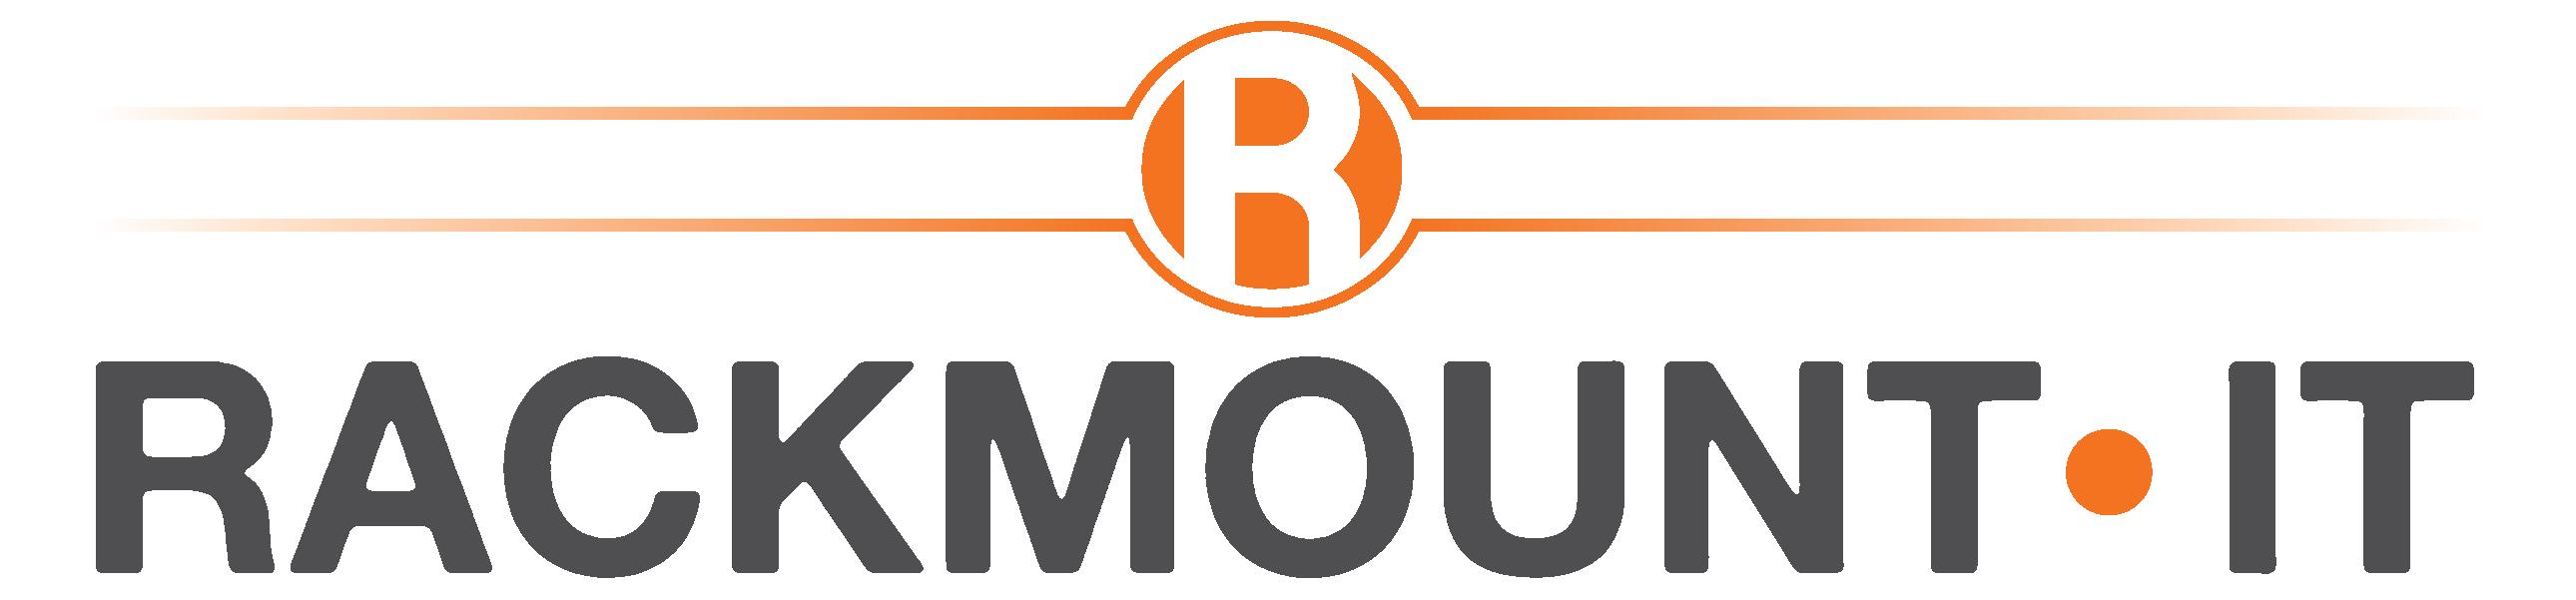 Rackmount.it Logo